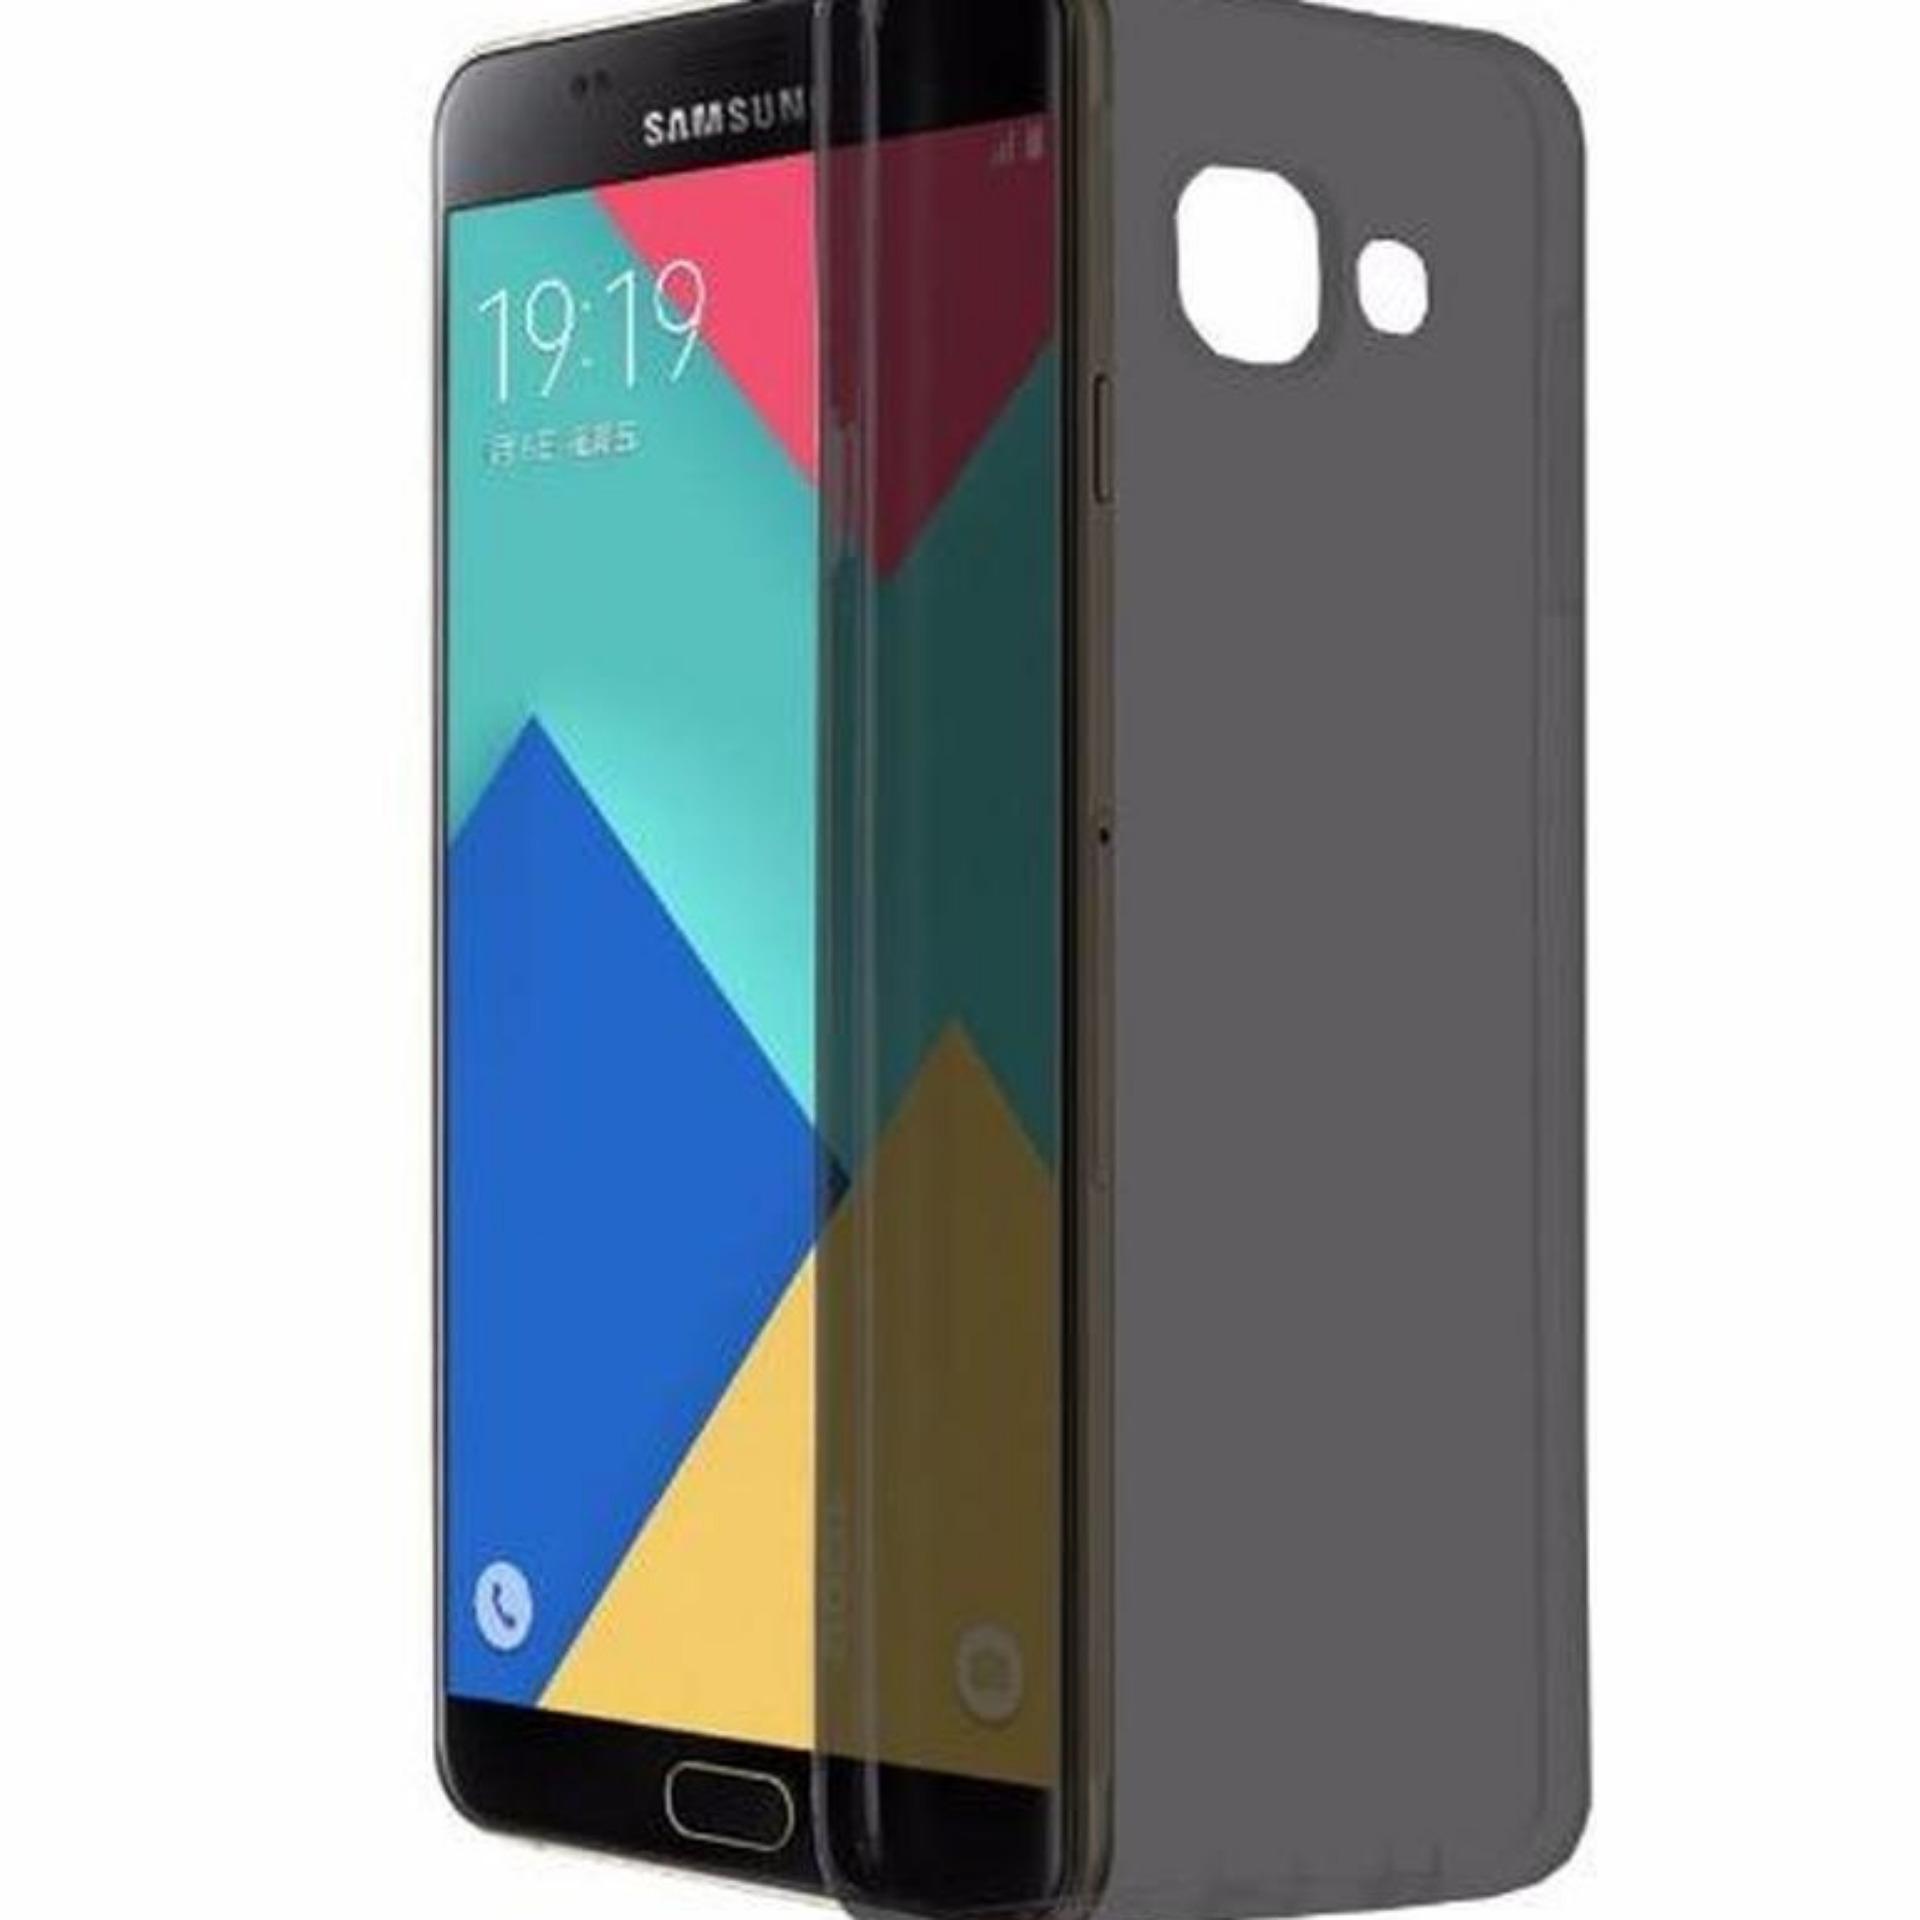 MNC Casing Handphone Softcase Ultrathin For Samsung Galaxy J7 Prime- Black .